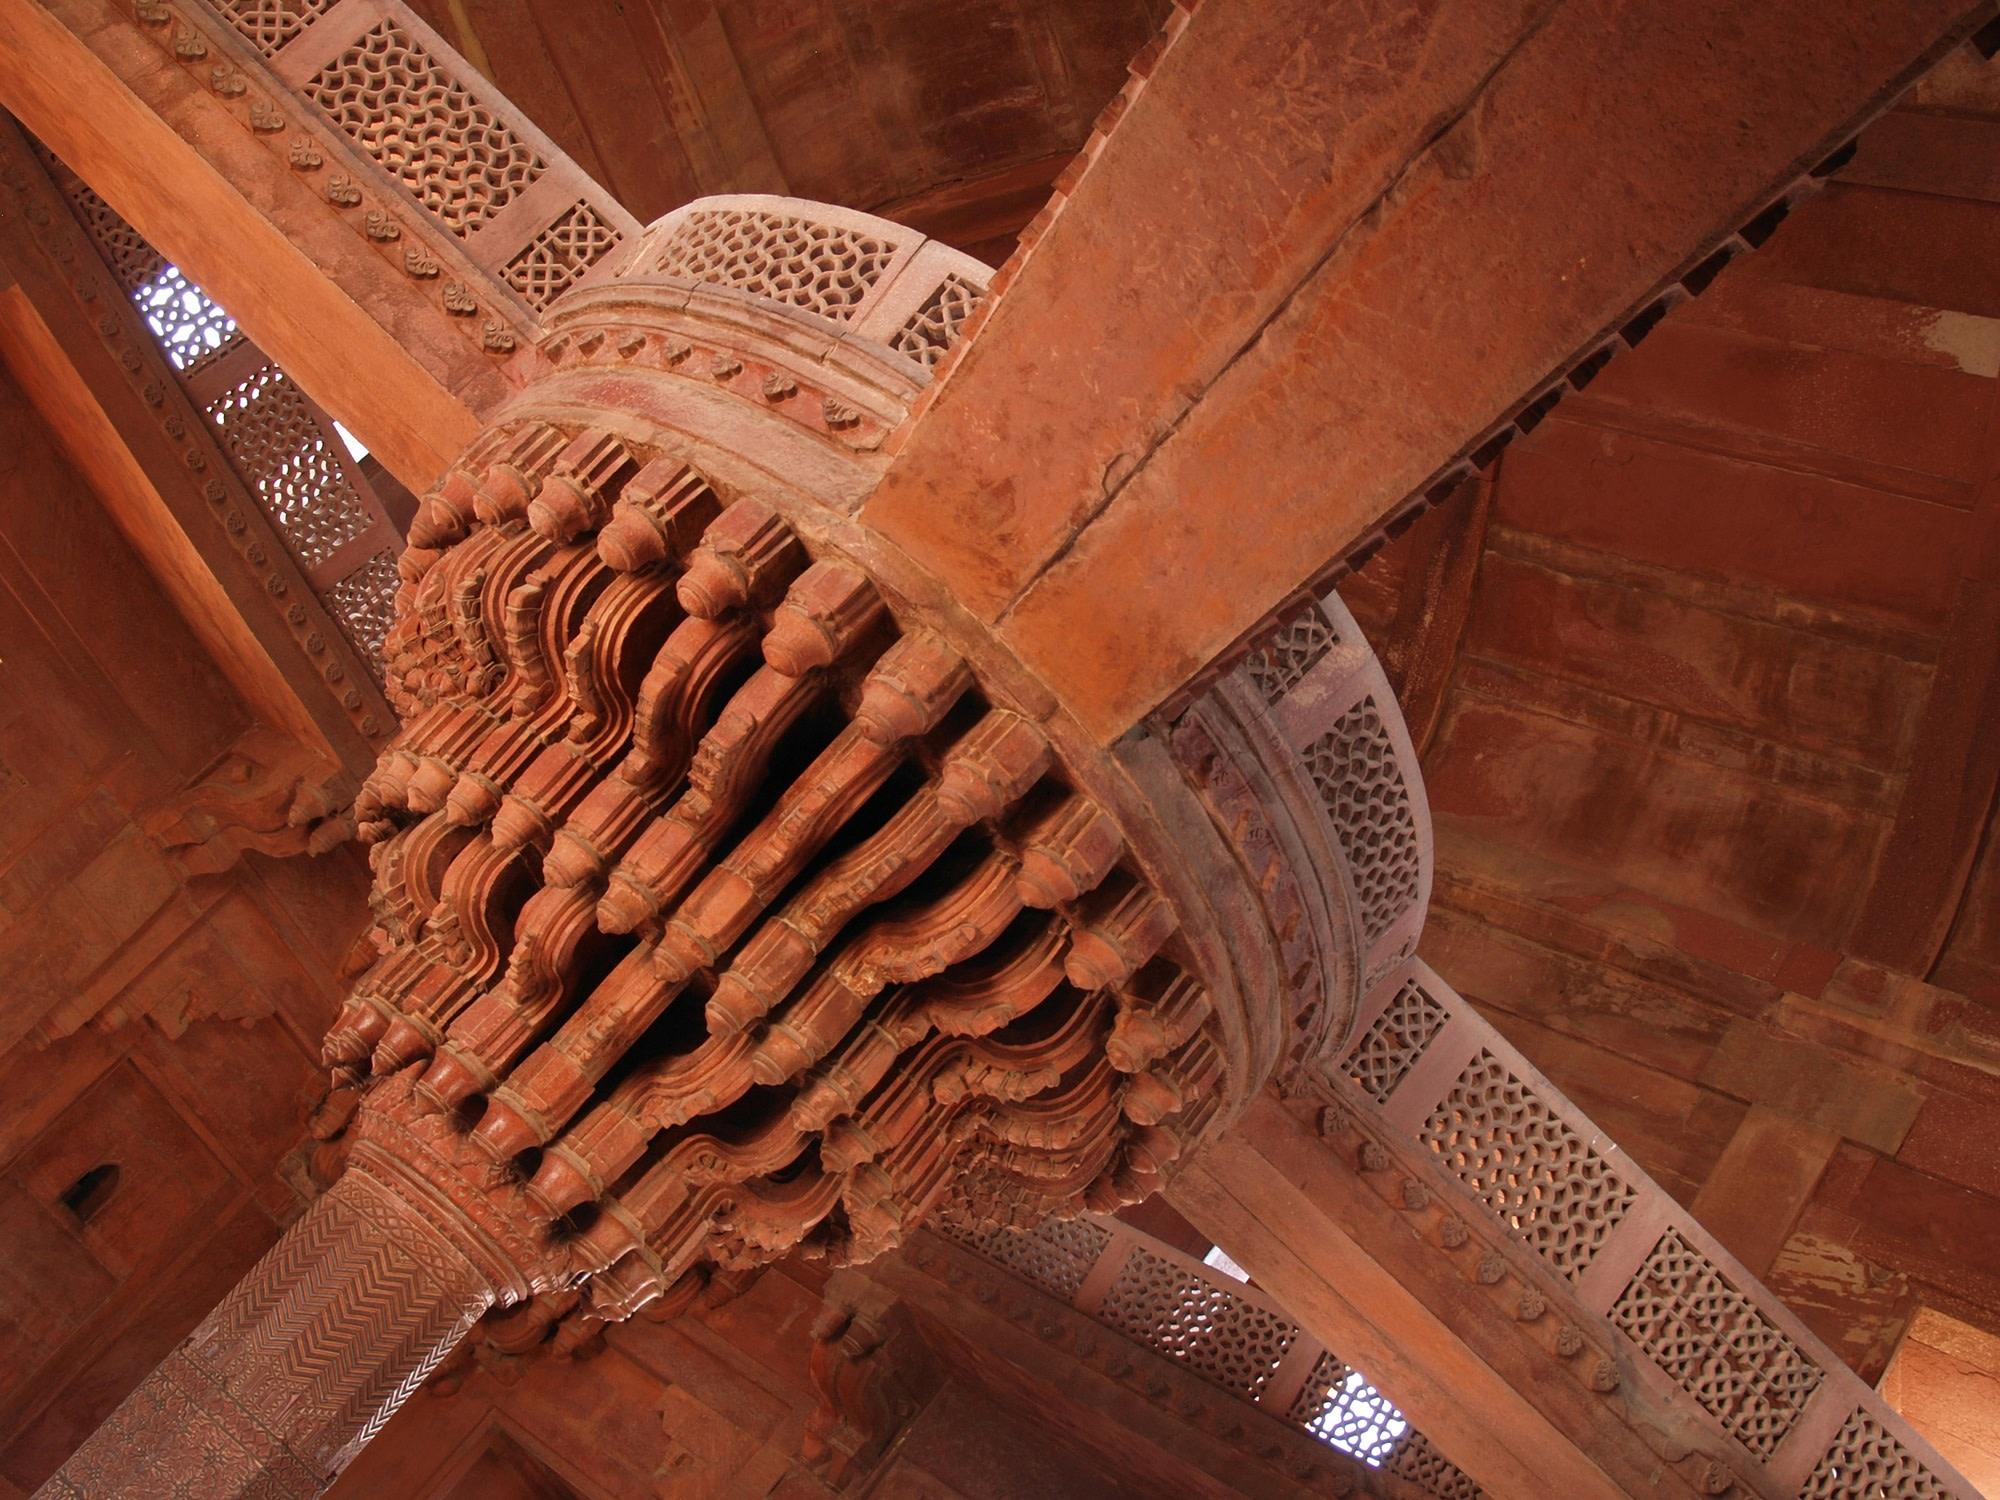 UNESCO World Heritage Site in Fatehpur Sikri